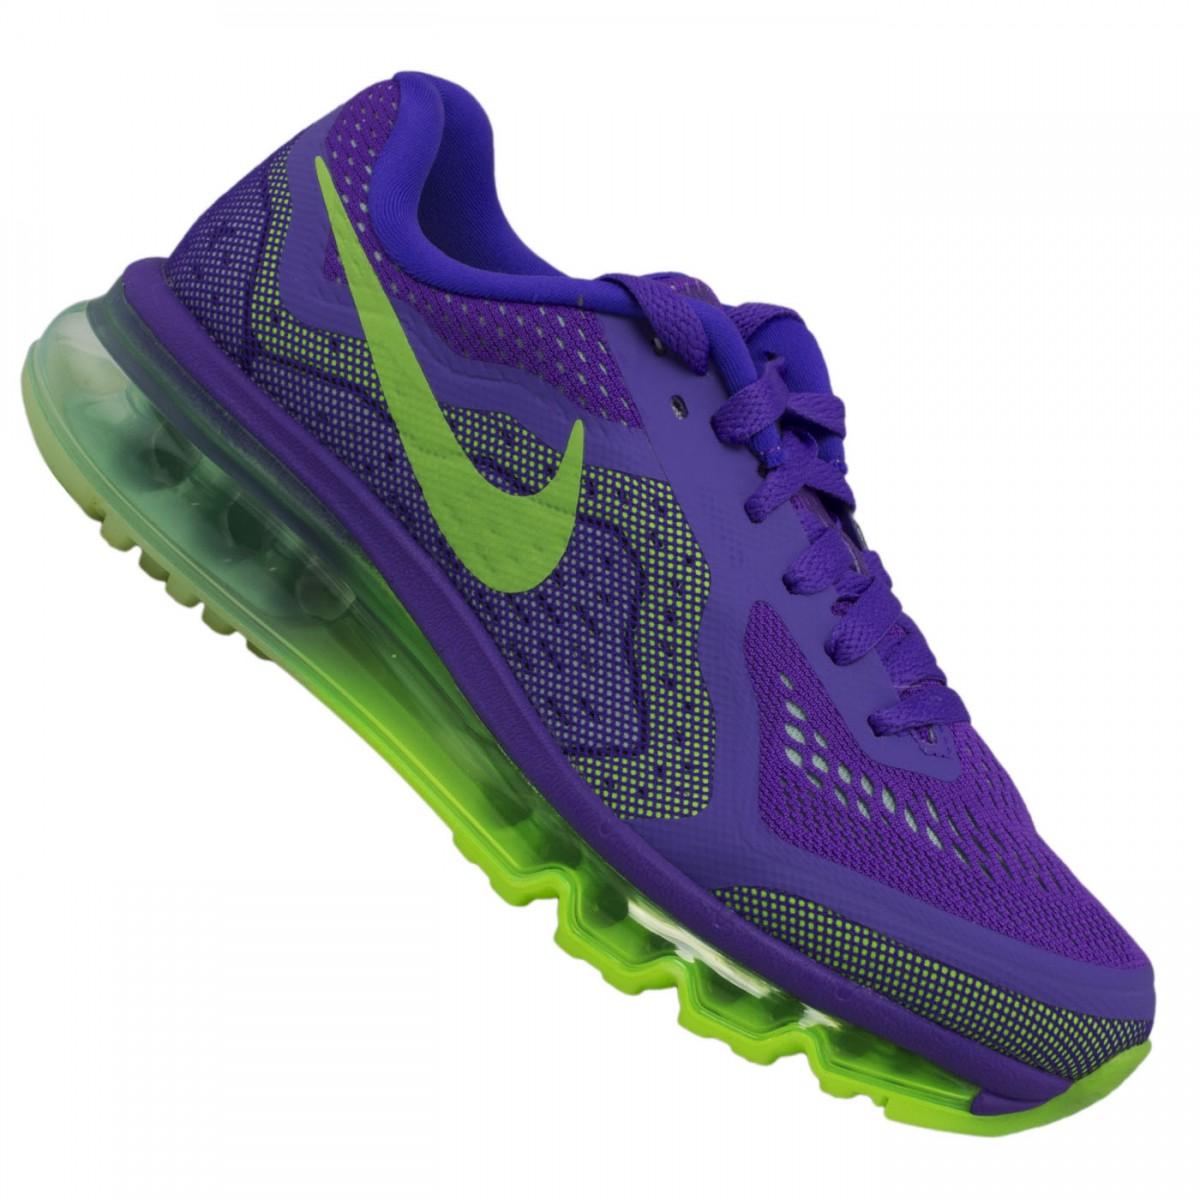 finest selection 1f7a3 d467e Tênis Nike Air Max 2014 - Feminino  Treino e Corrida